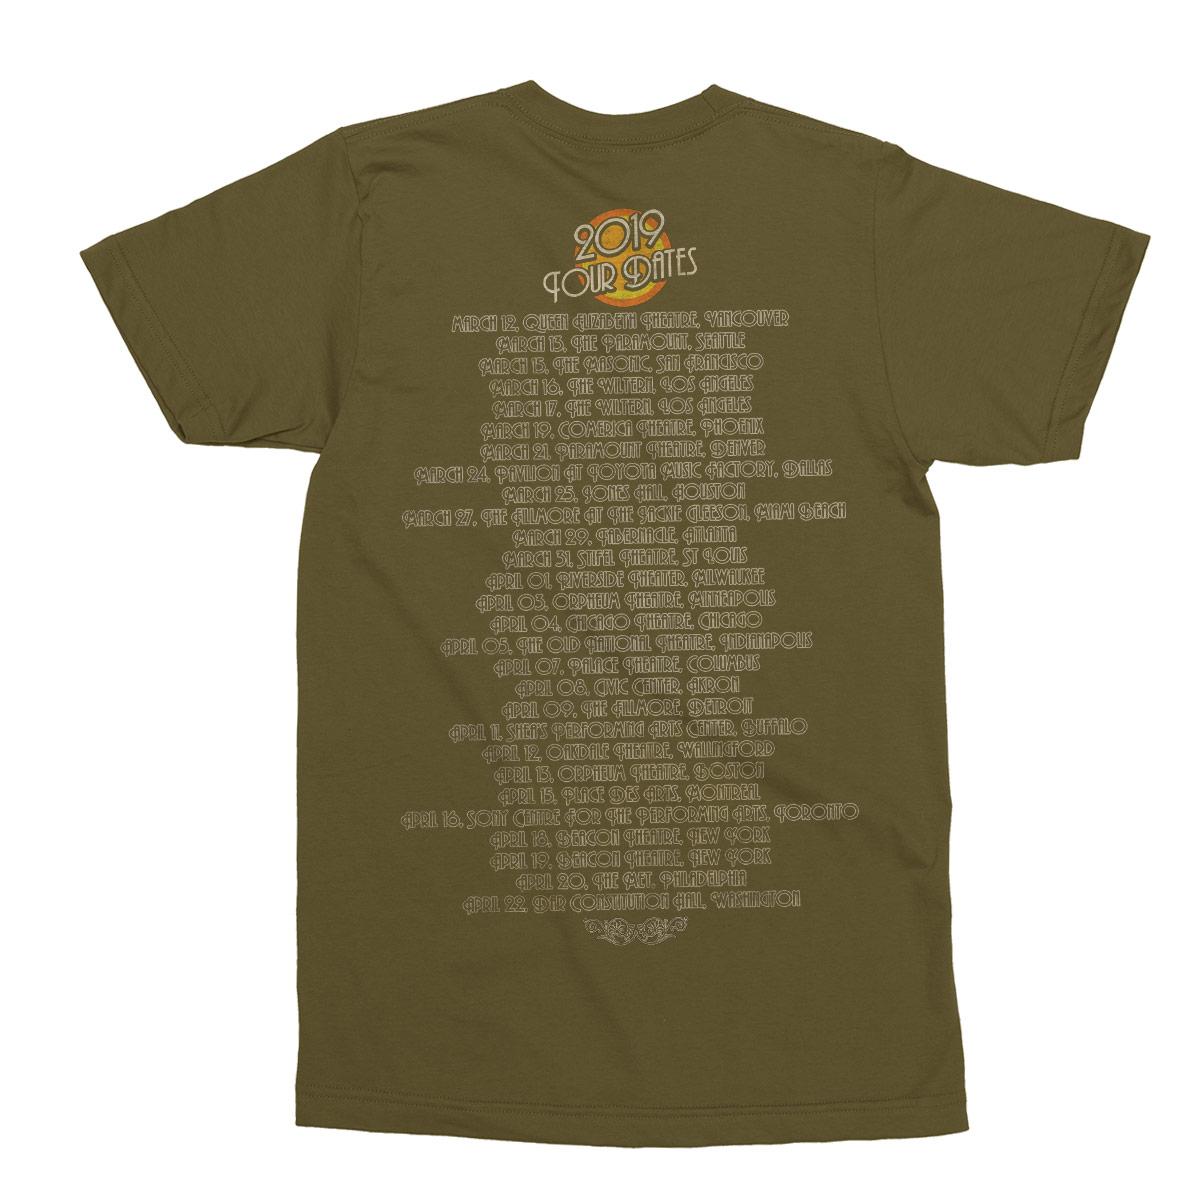 2019 Saucerful of Secrets Tour Pocket Print Dateback T-Shirt